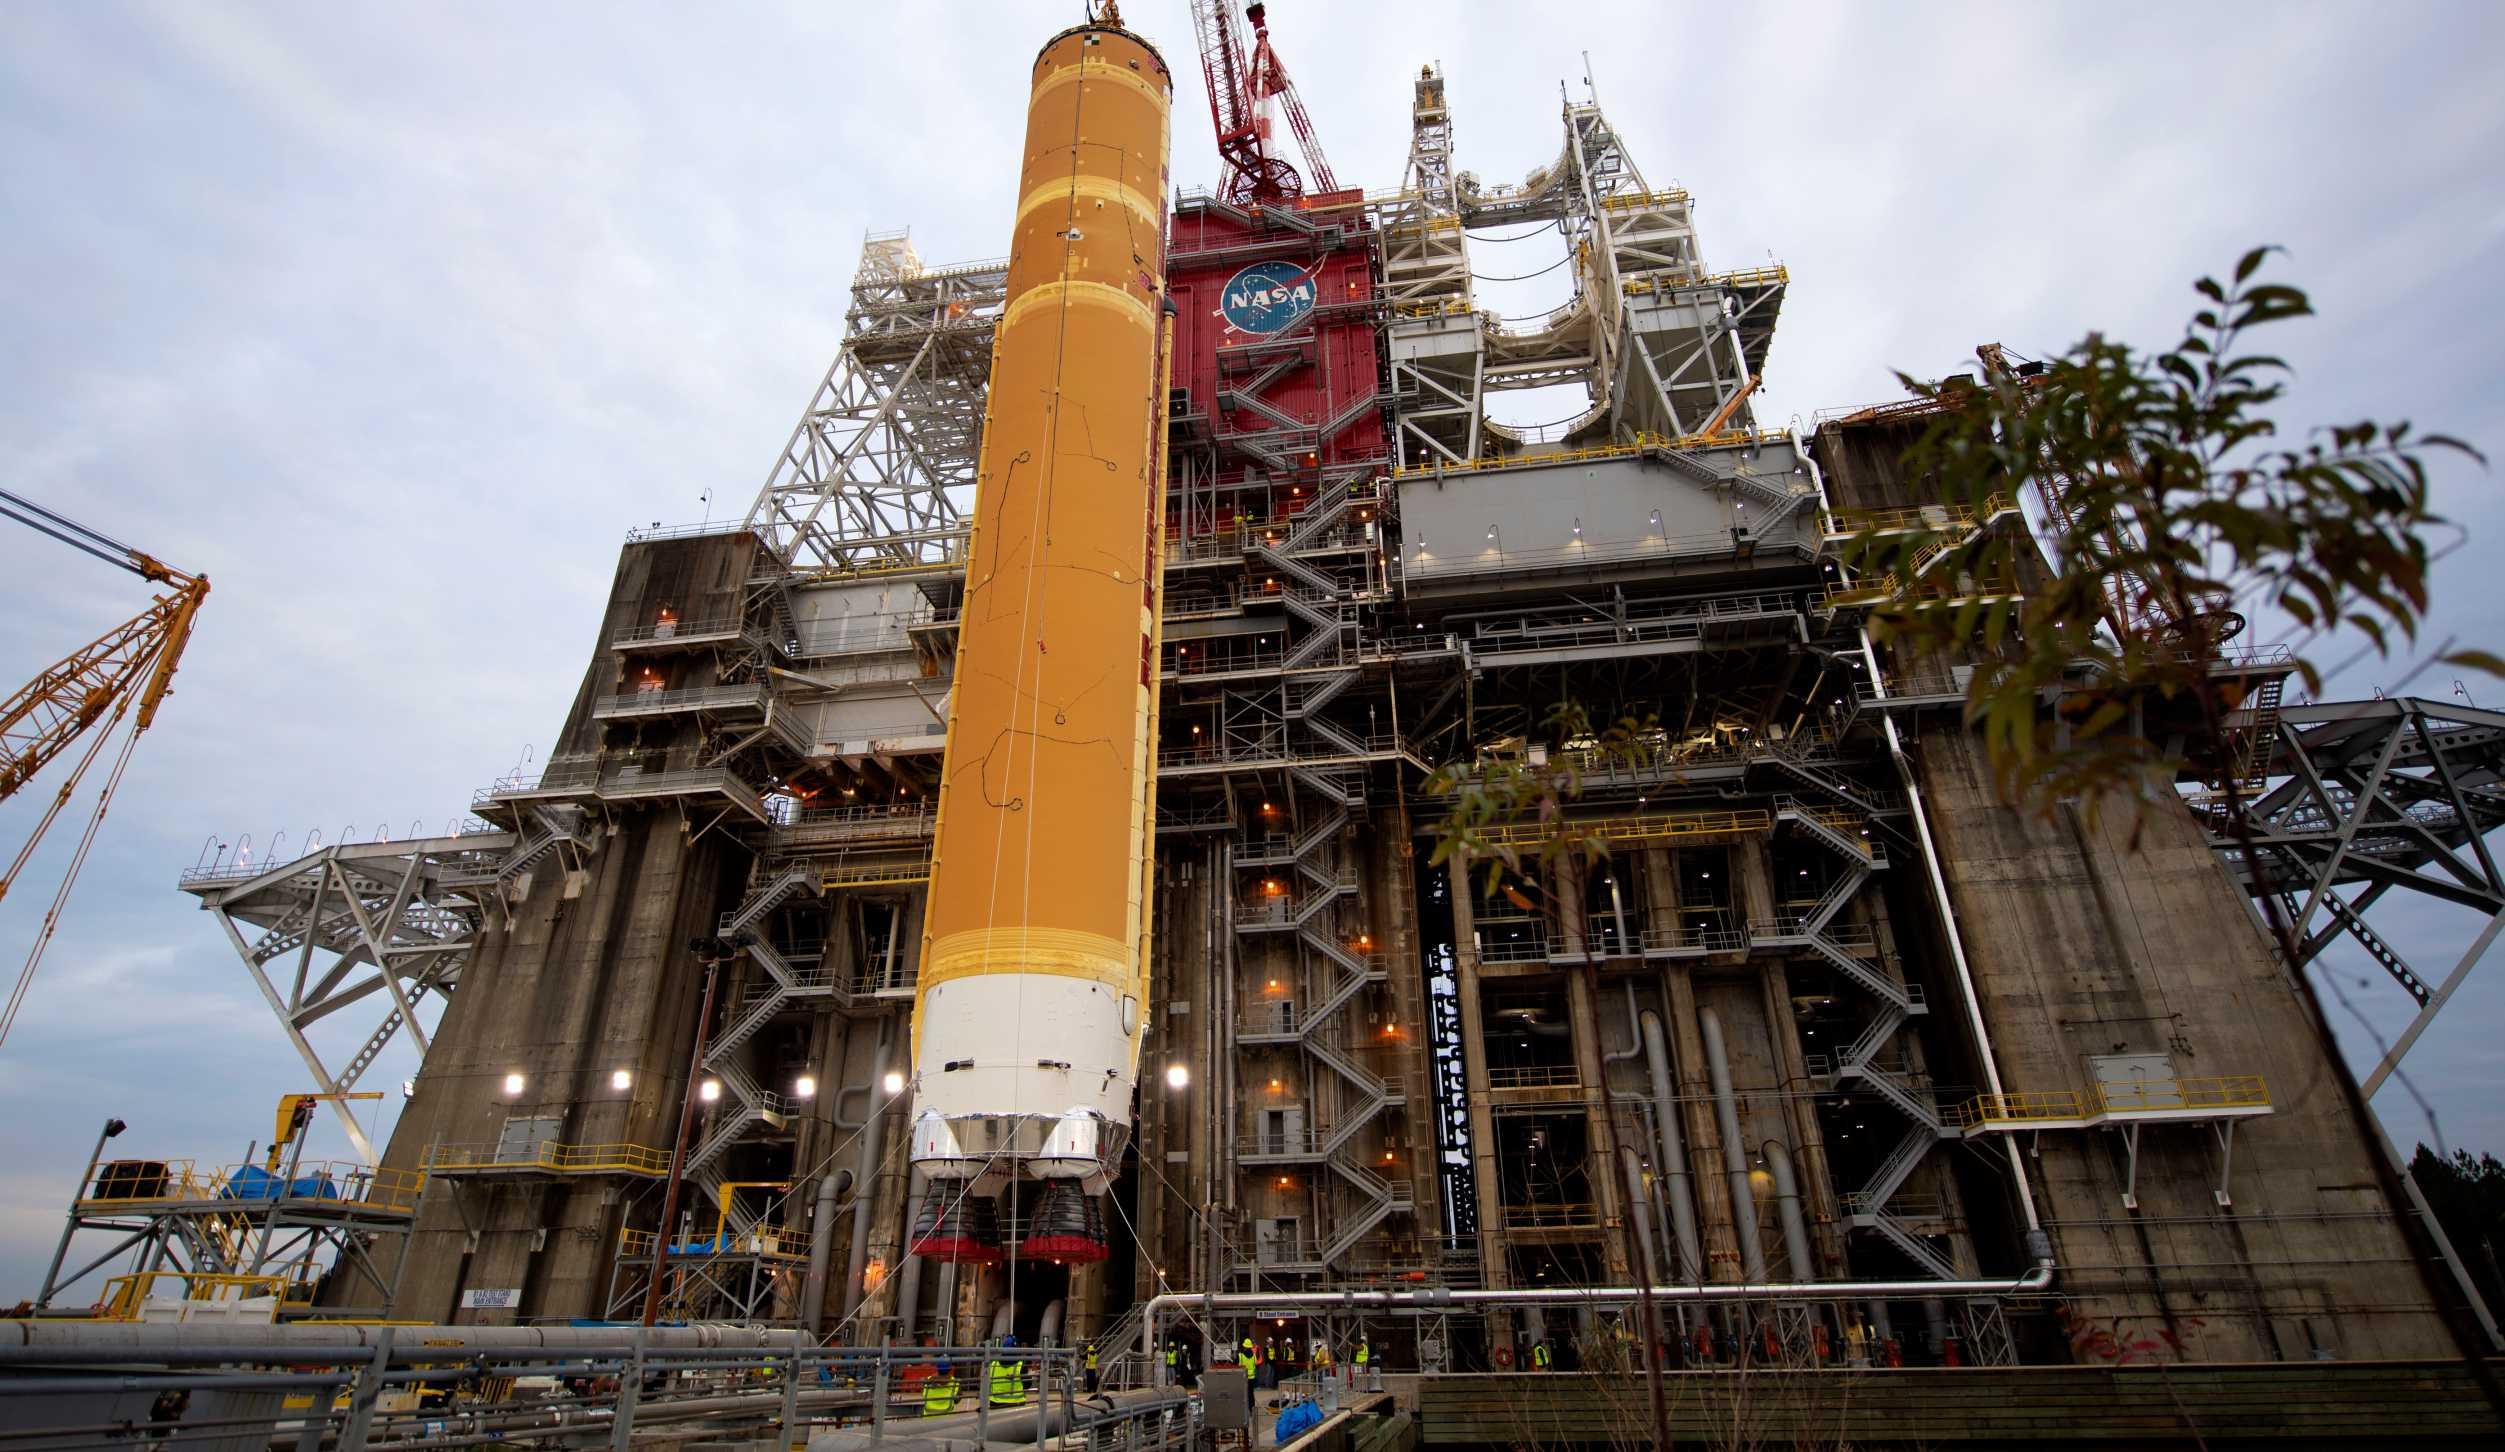 SLS CS-1 Stennis lift 012220 (NASA) 17 crop (c)